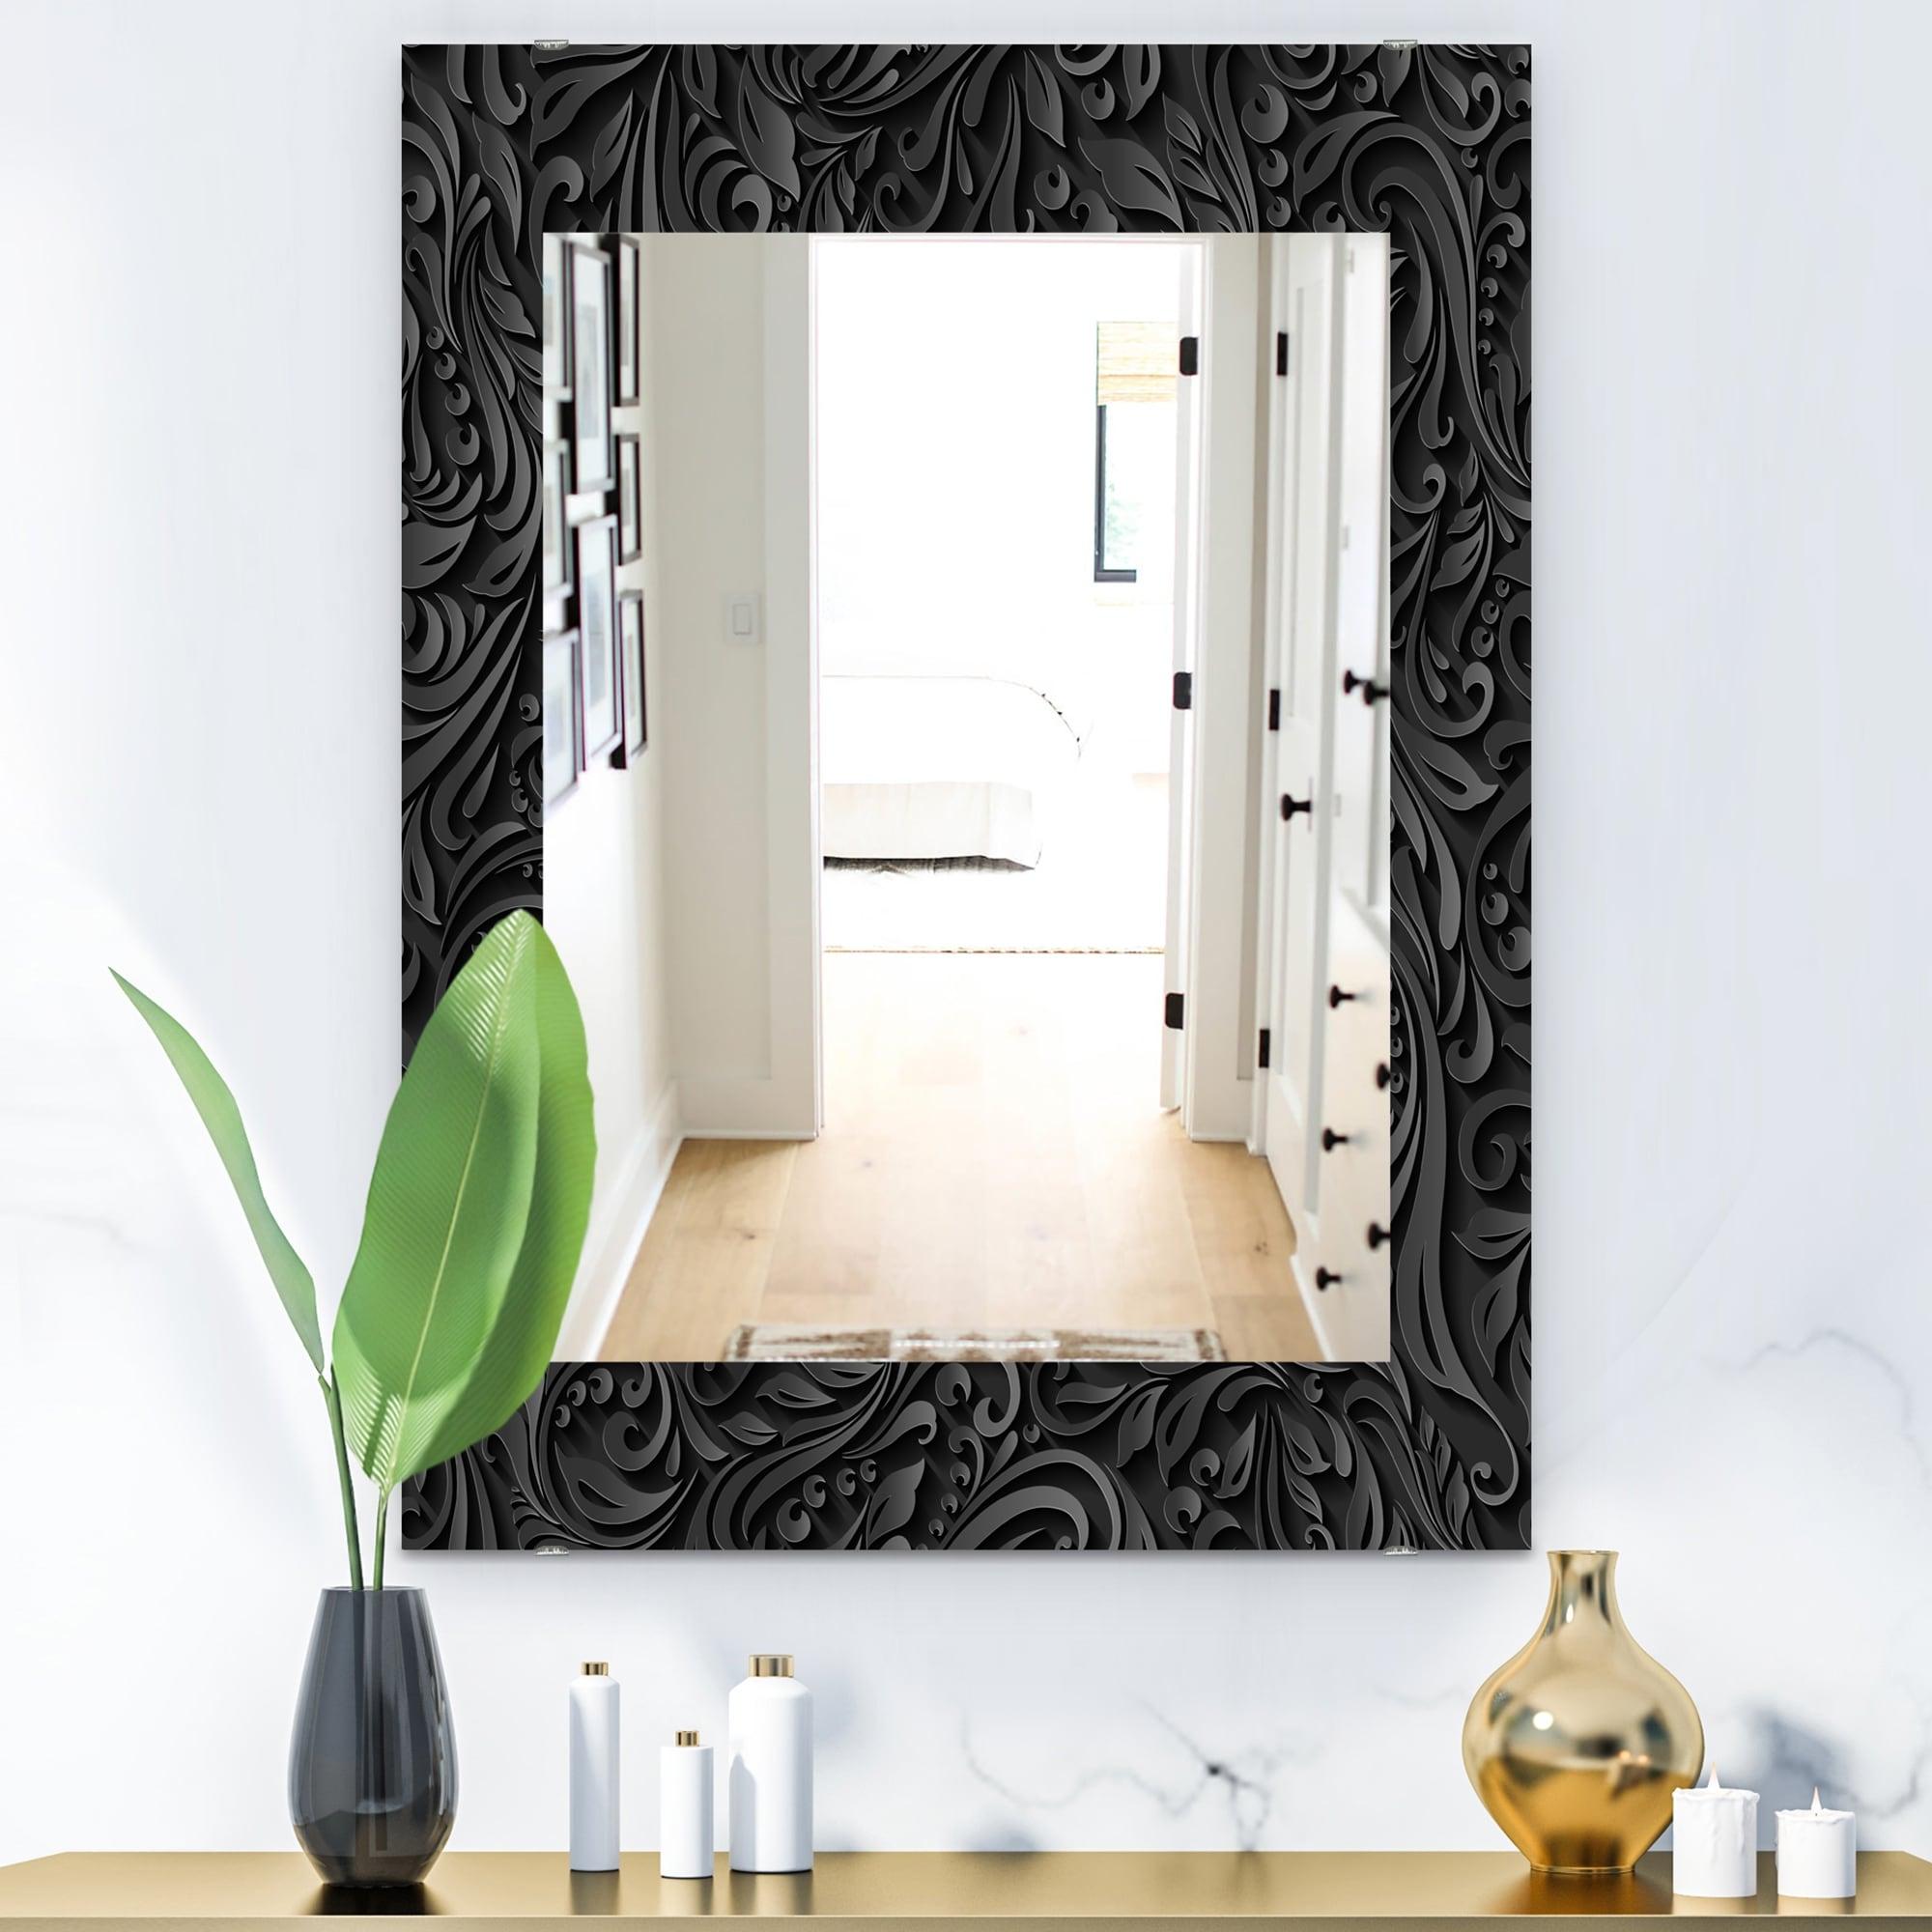 Designart Obsidian Impressions 10 Modern Mirror Wall Mirror On Sale Overstock 28558814